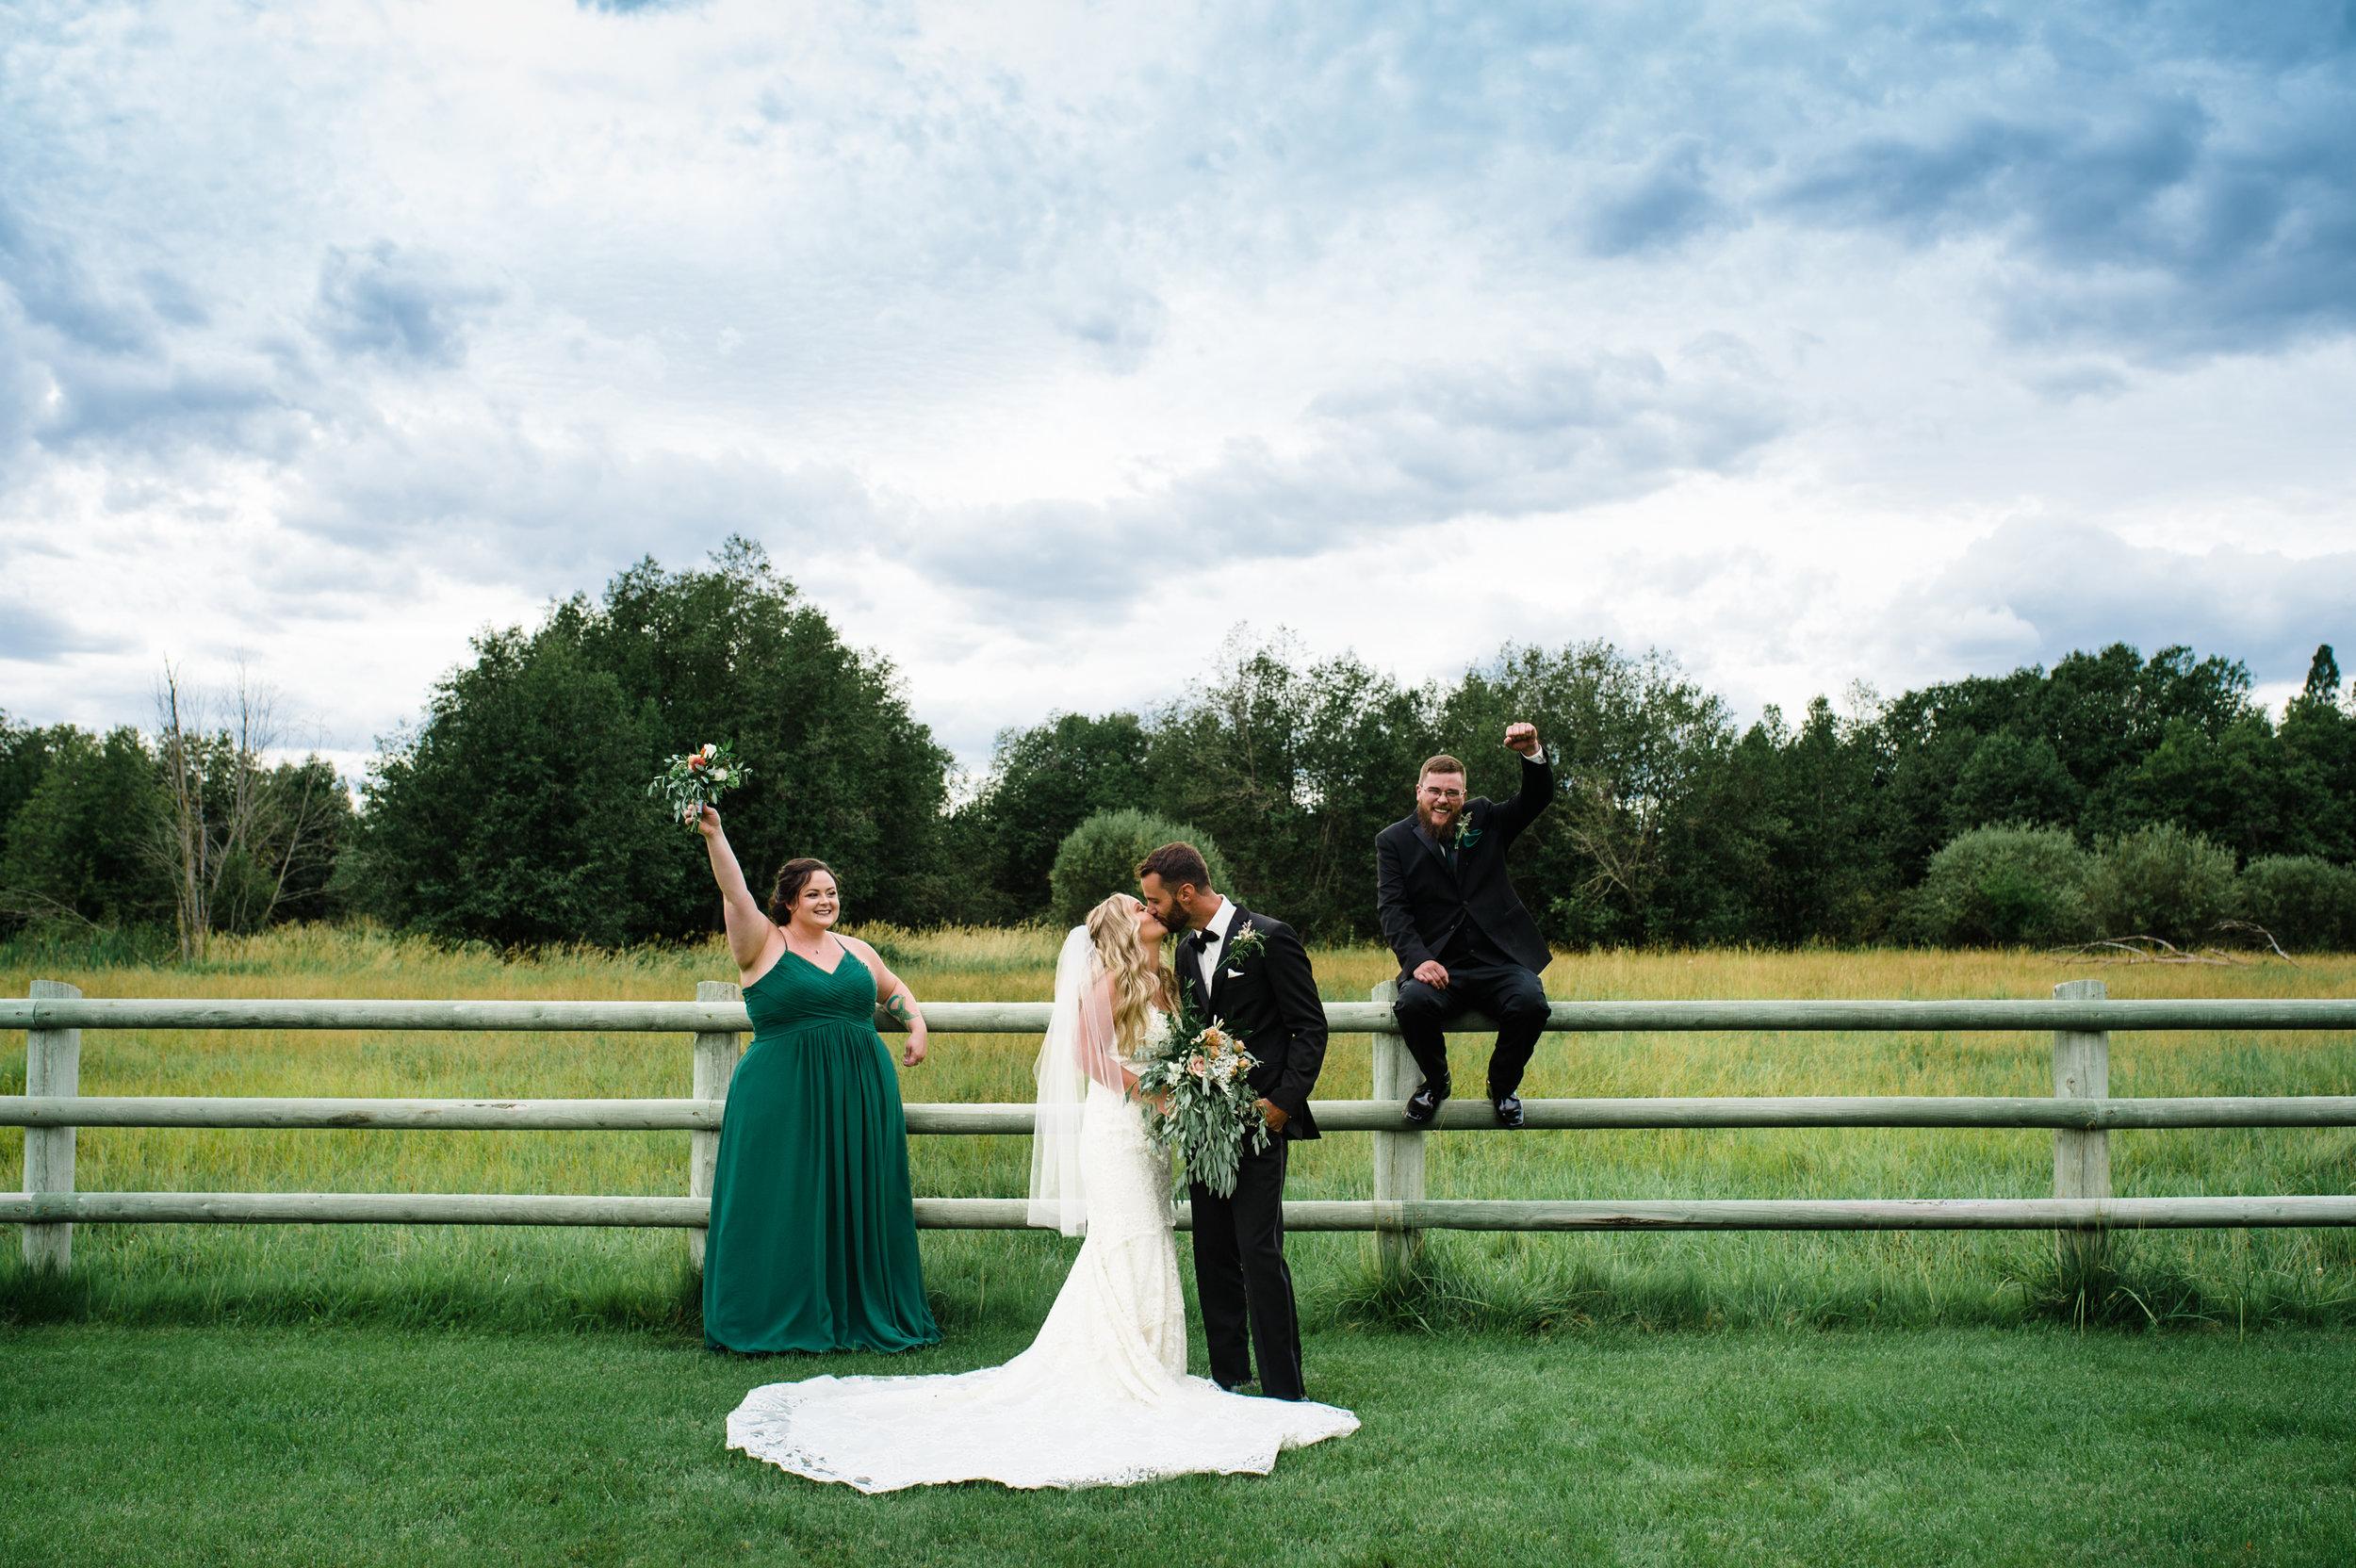 013Sky Ridge Ranch Wedding_Montana Wedding Photographer_Jessica & Brian_Honeybee Weddings_August 24, 2019-8.jpg